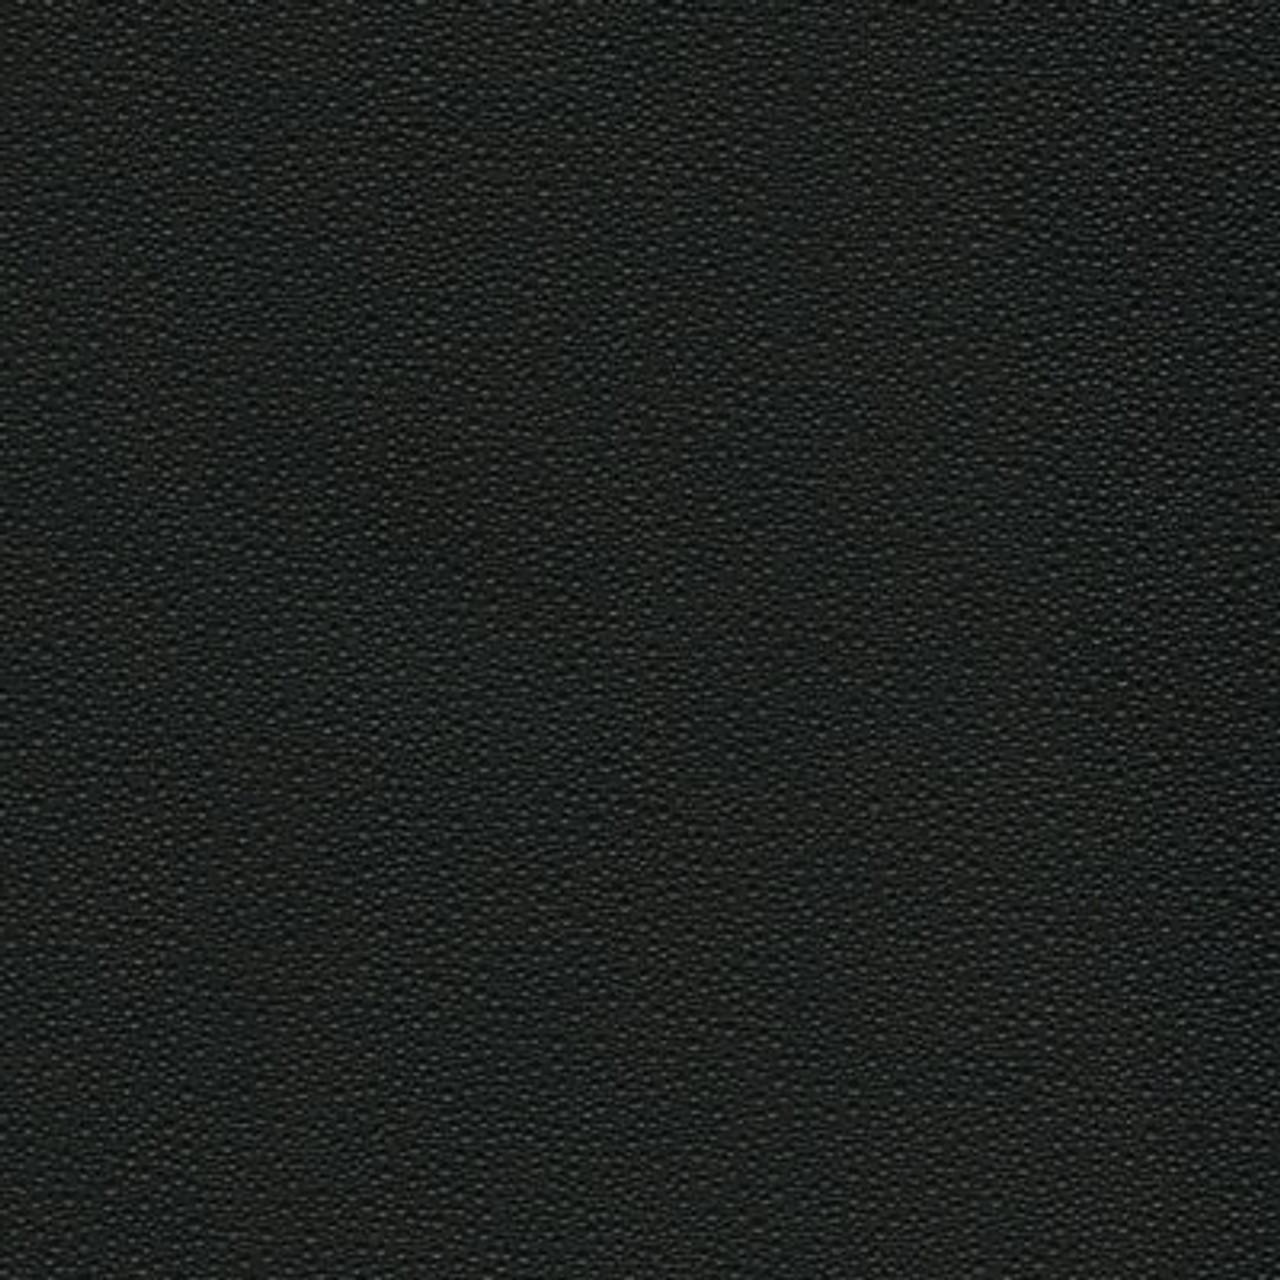 "Enduratex Vinyl Headliner CLASSIC CRATER 754 Black 54"" - Sold by the Yard"